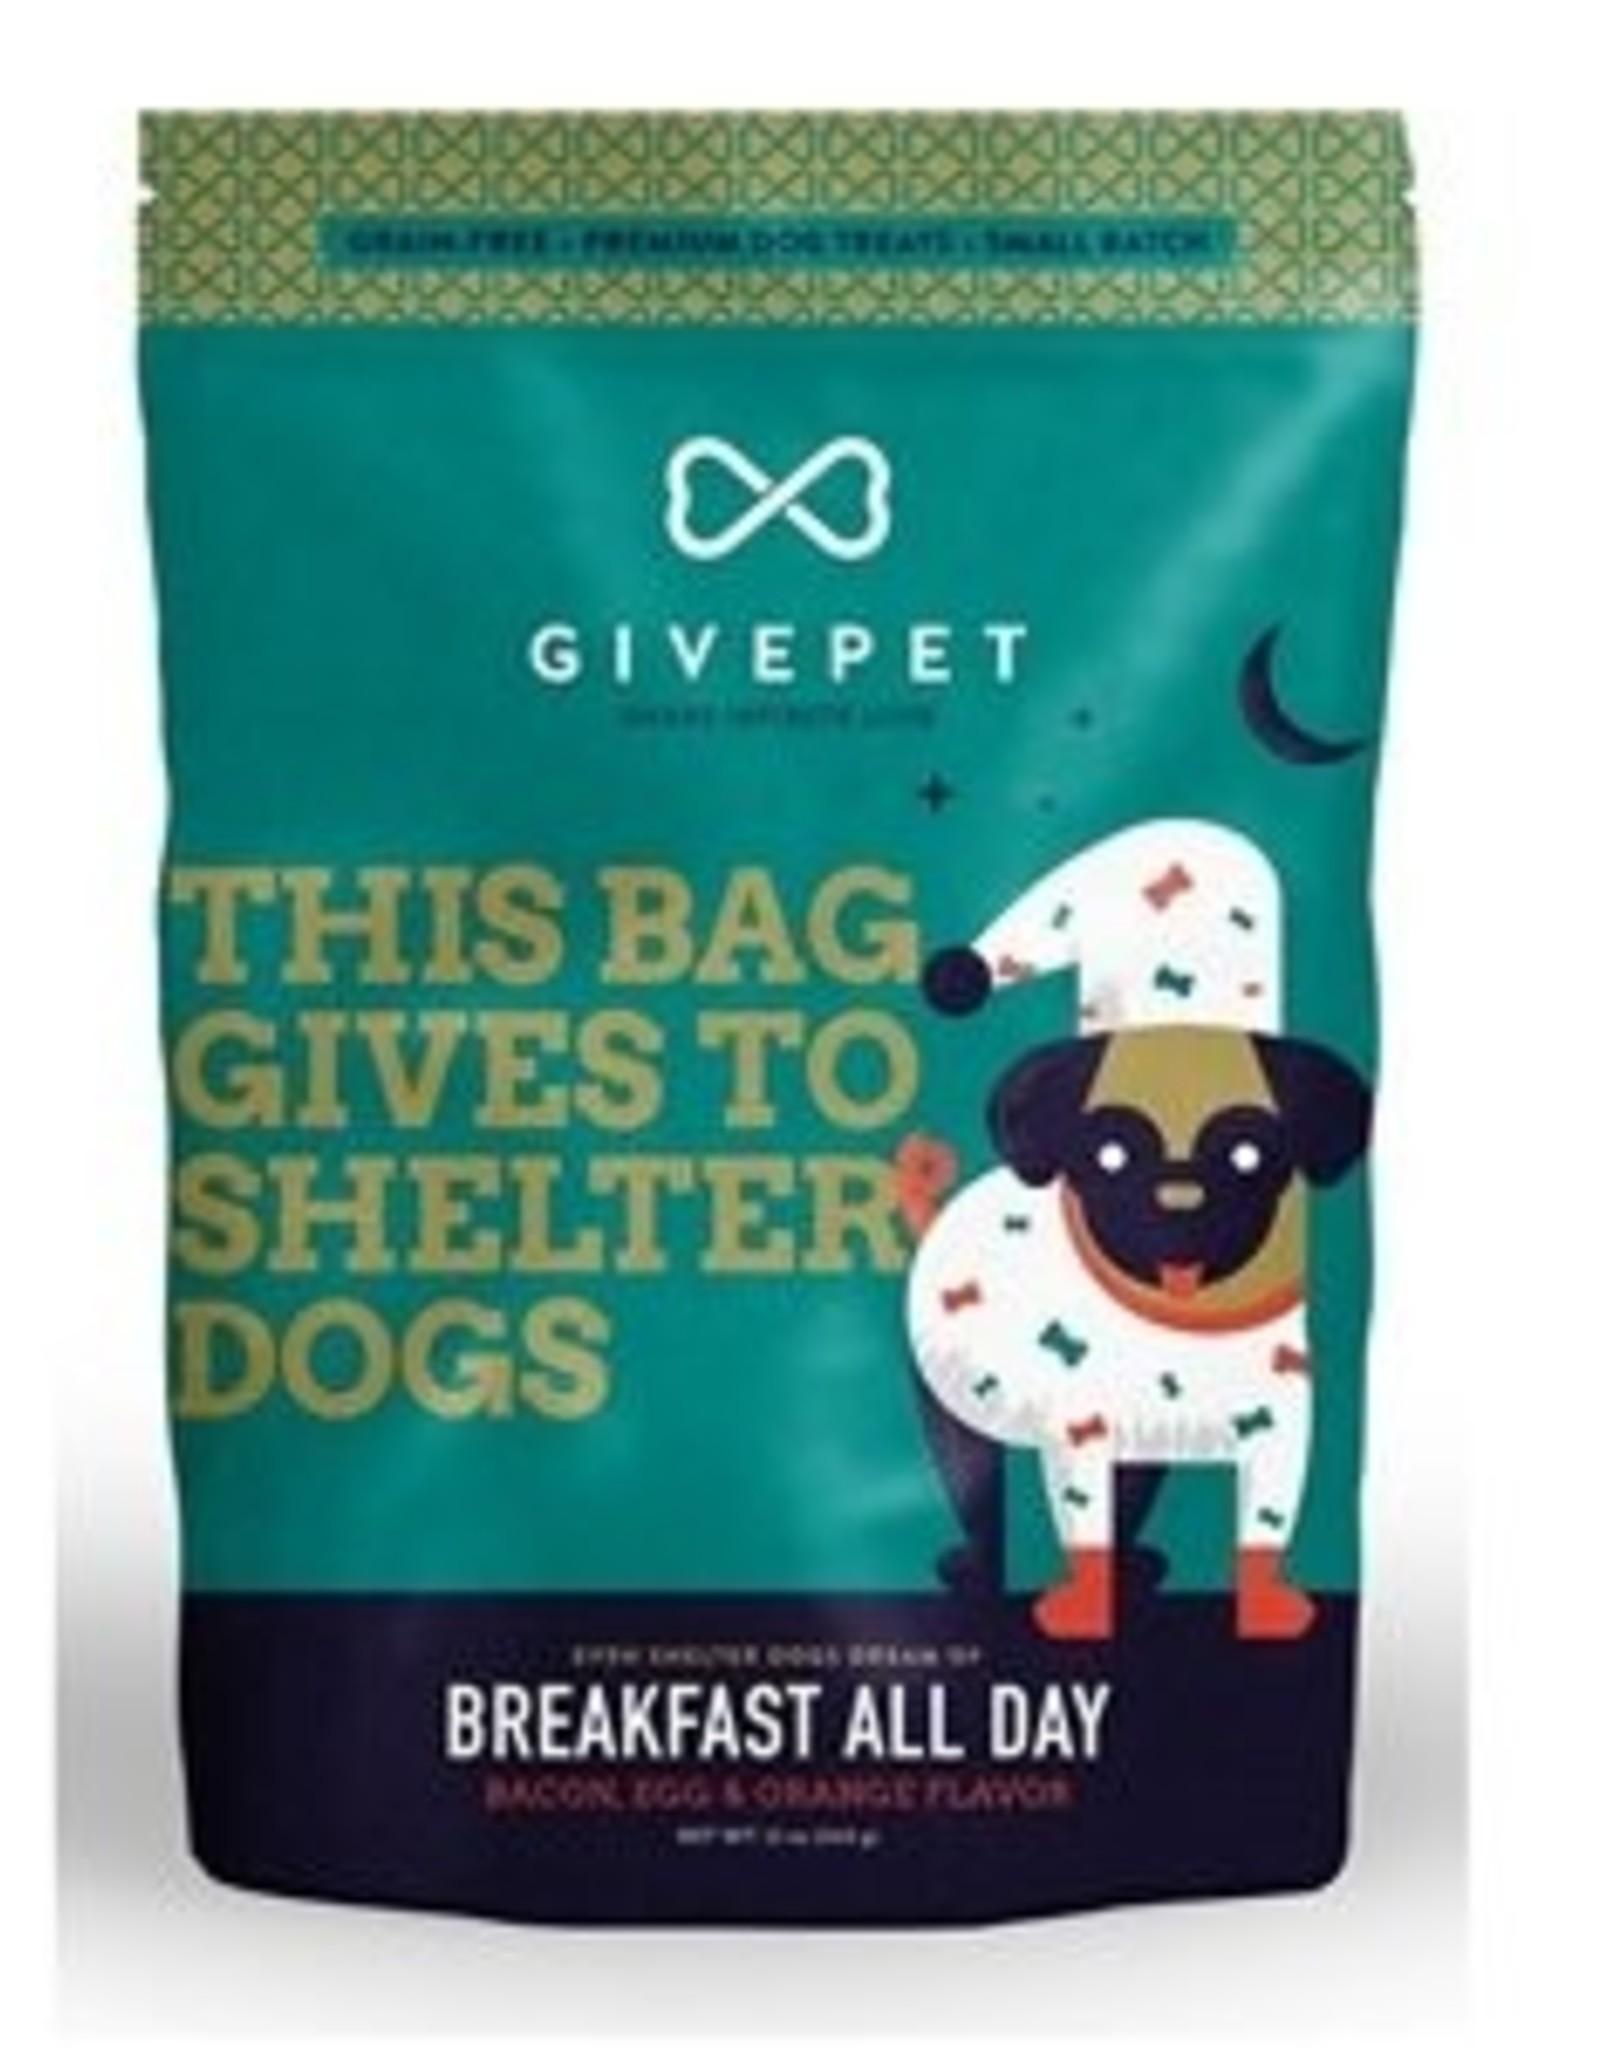 Give Pet Breakfast All Day Bacon, Egg & Orange Flavor Dog Treats, 12 oz.